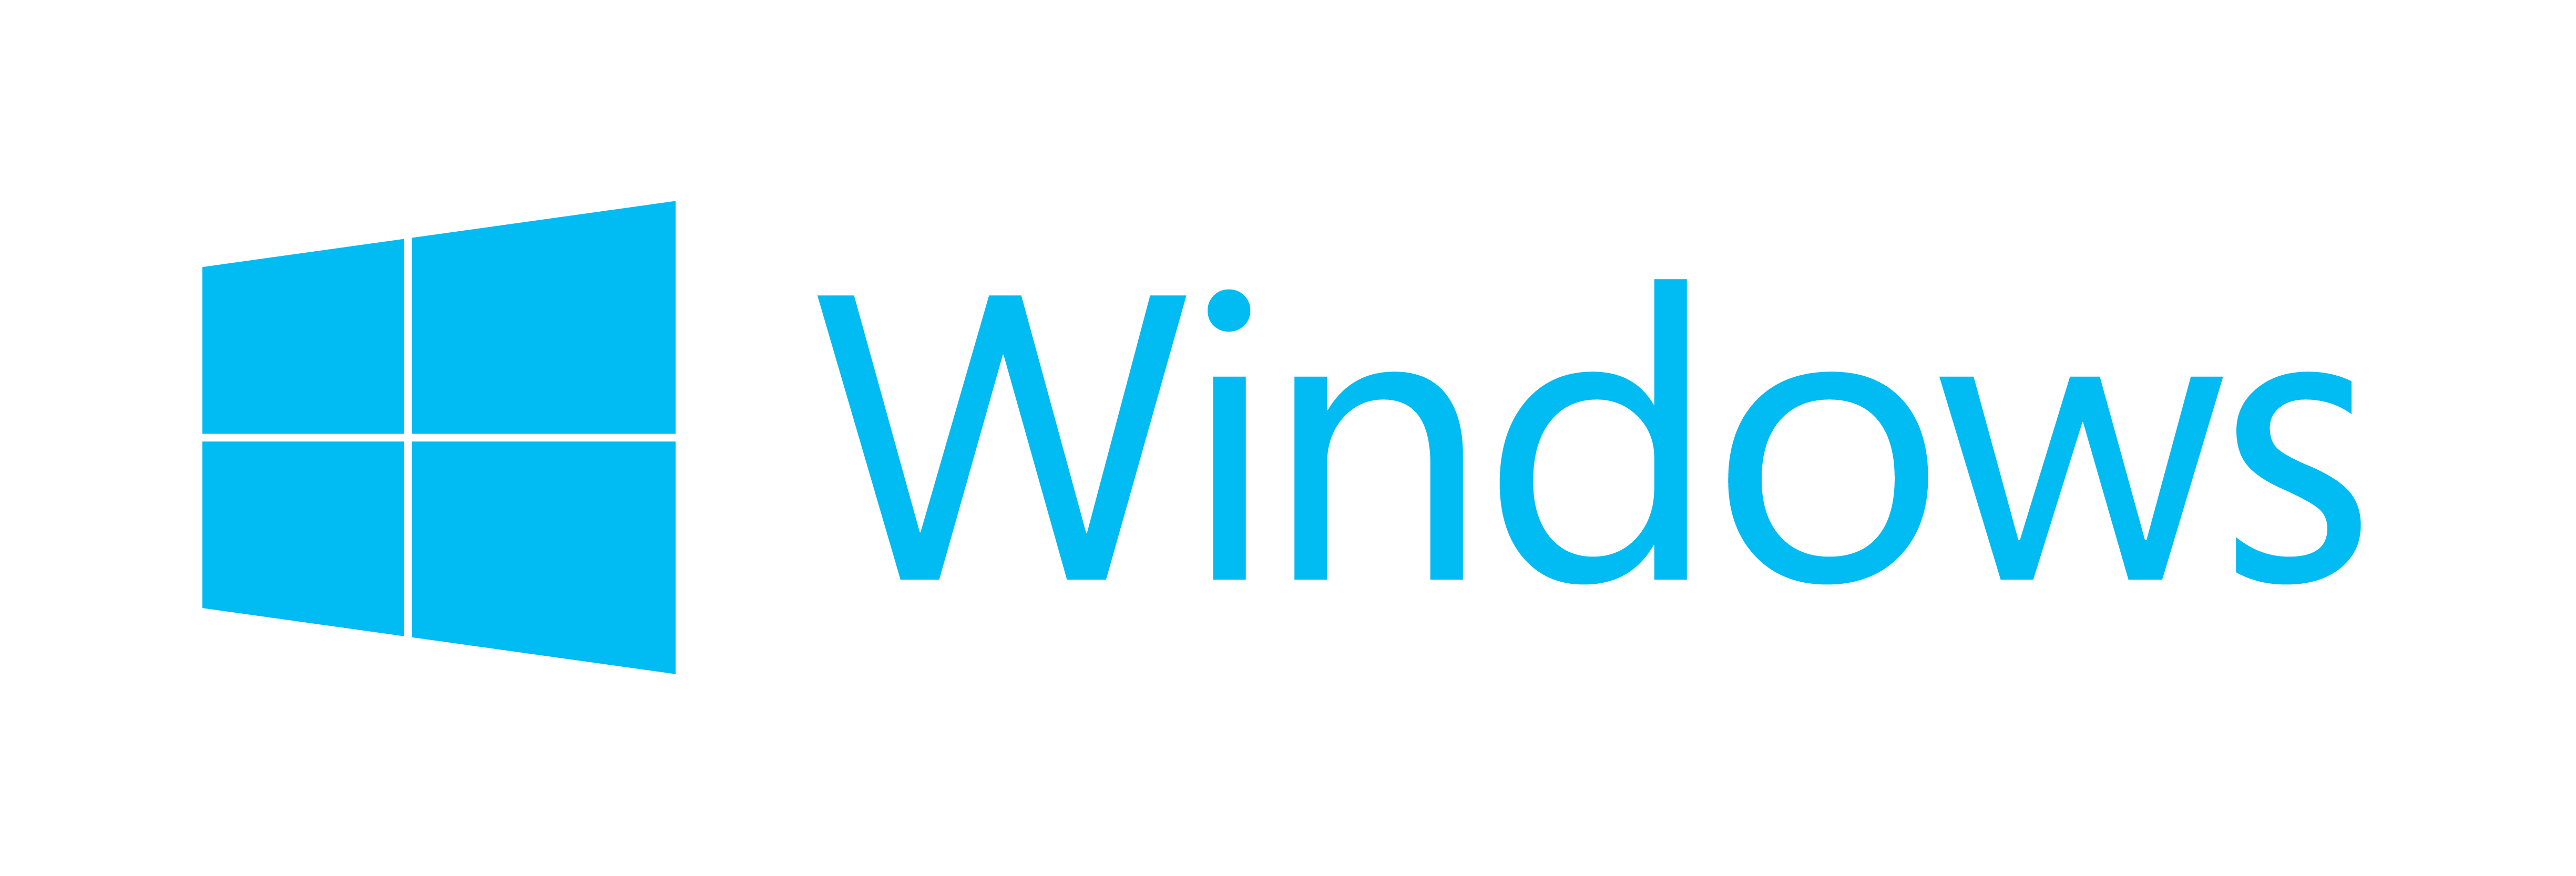 Download PNG image - Microsoft Windows Png Clipart - Microsoft Windows PNG